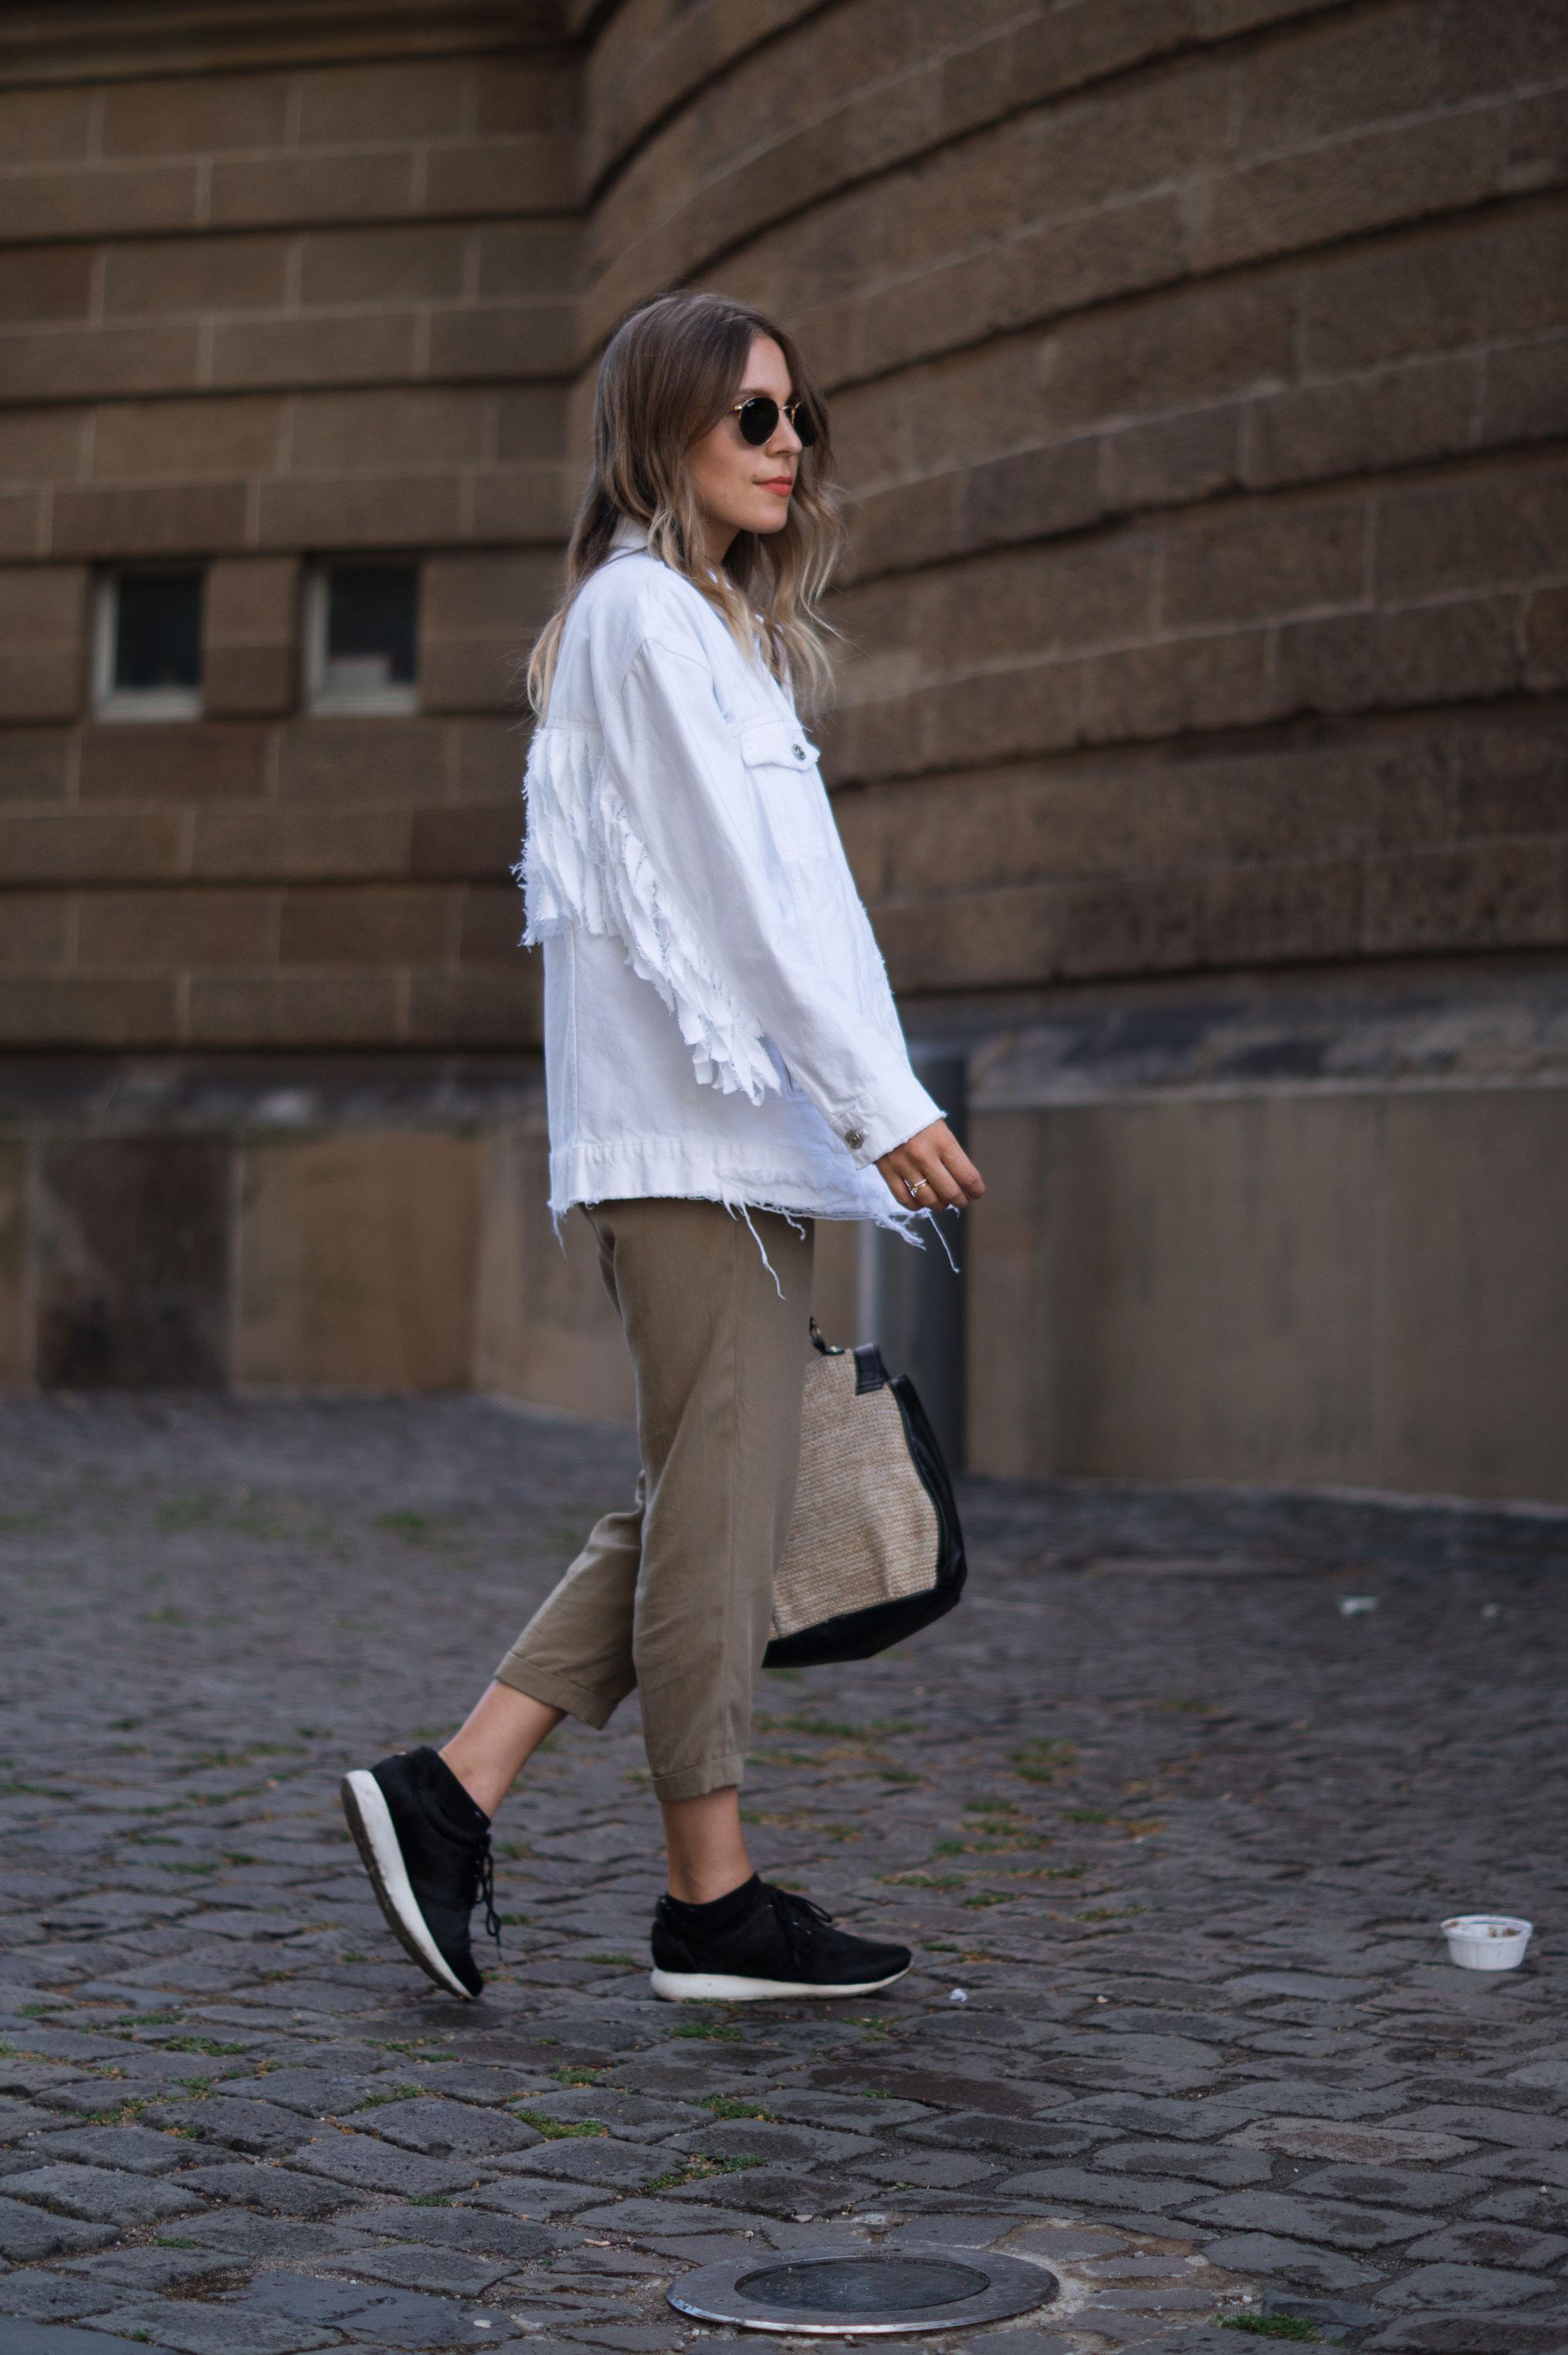 Fringed Denim Jacket Fransenjacke weiße Jeansjacke Casual Outfit Sariety Fashionblogger Modeblog Heidelberg Mannheim Wasserturm-8